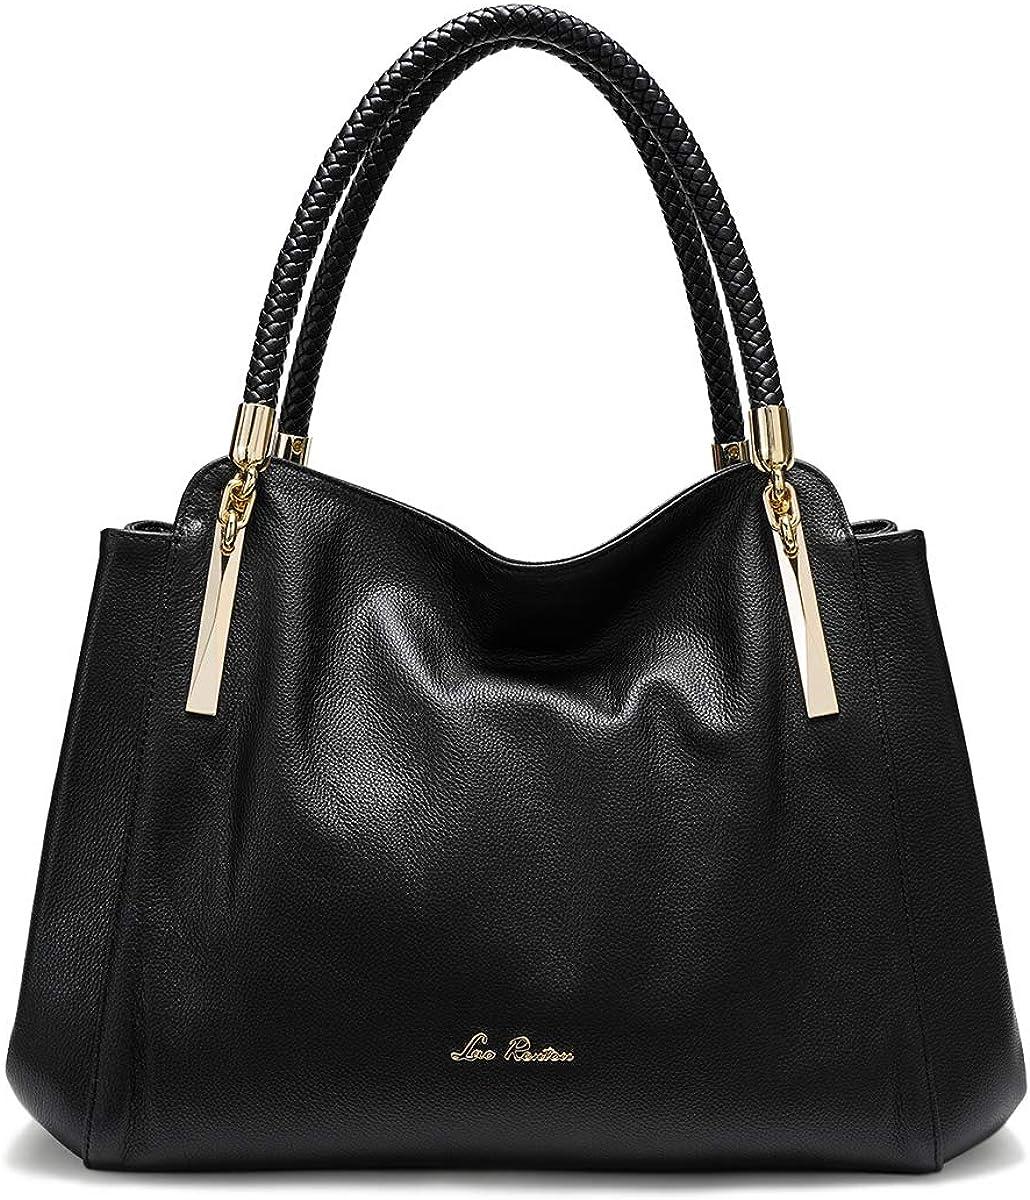 LAORENTOU Genuine Cow Leather Handbags for Women Ladies Top-handle Tote Purse Shoulder Bags